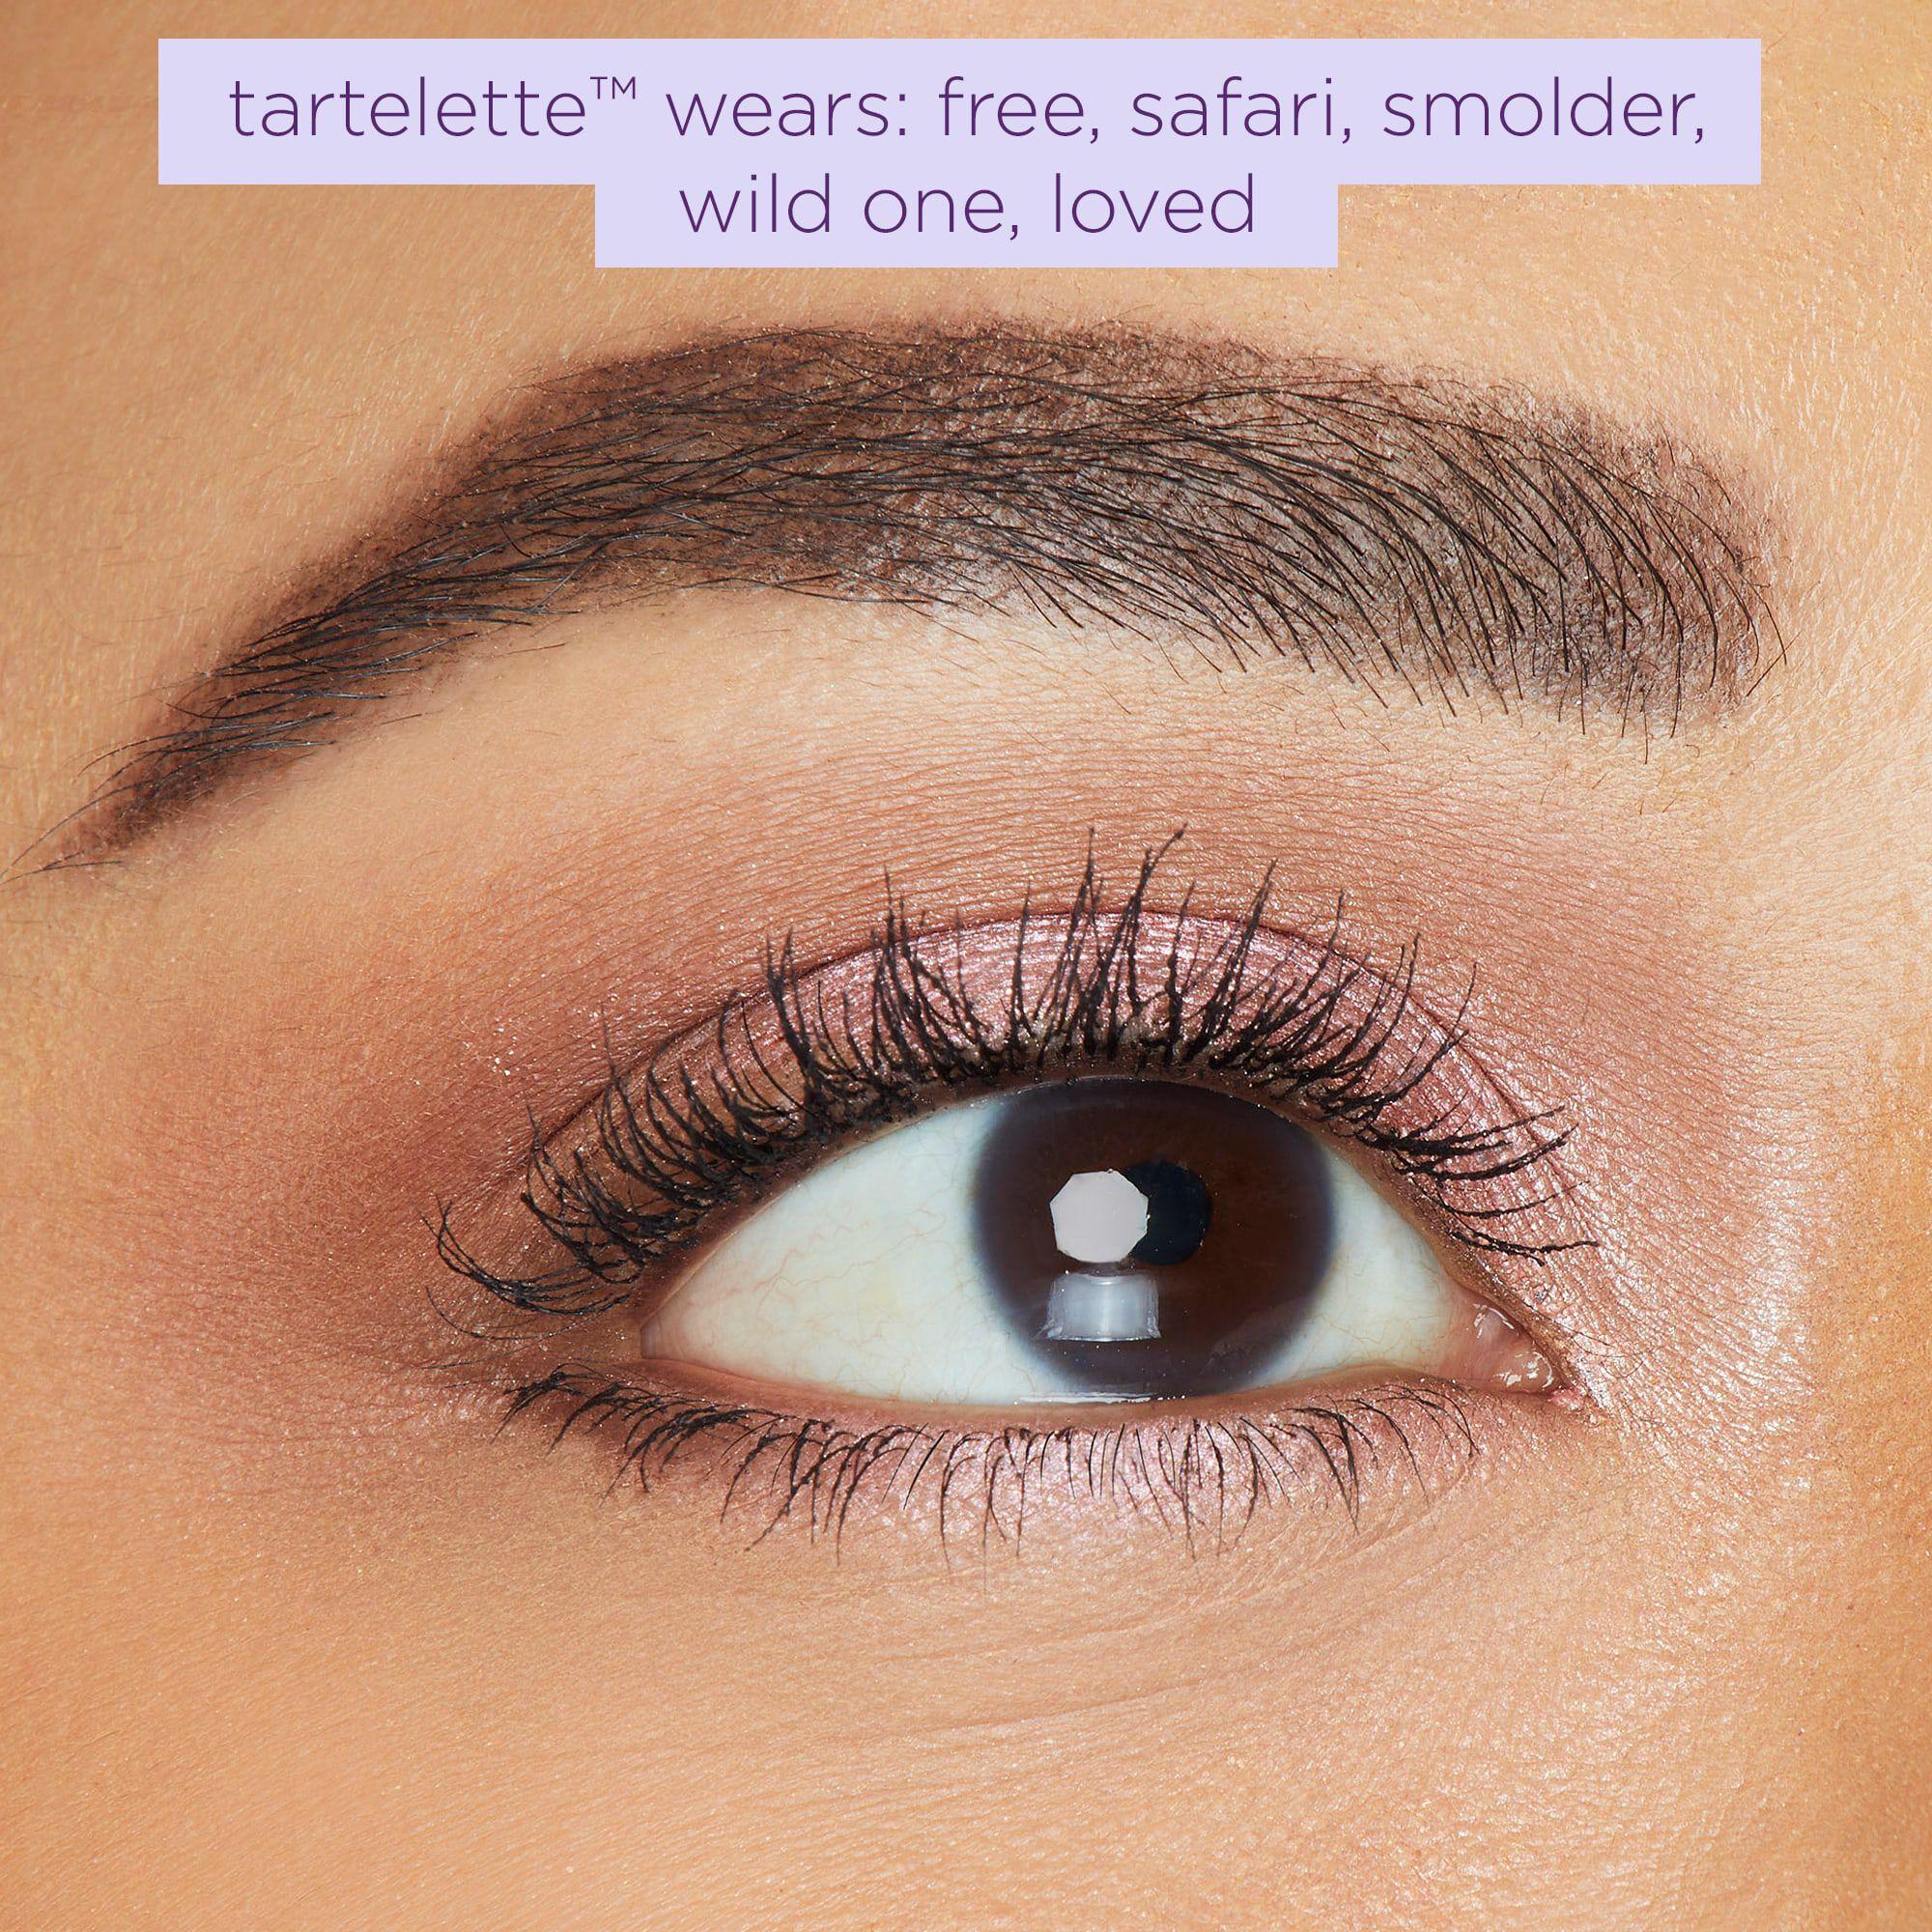 Tarte Maneater Temptation Eyeshadow Wardrobe